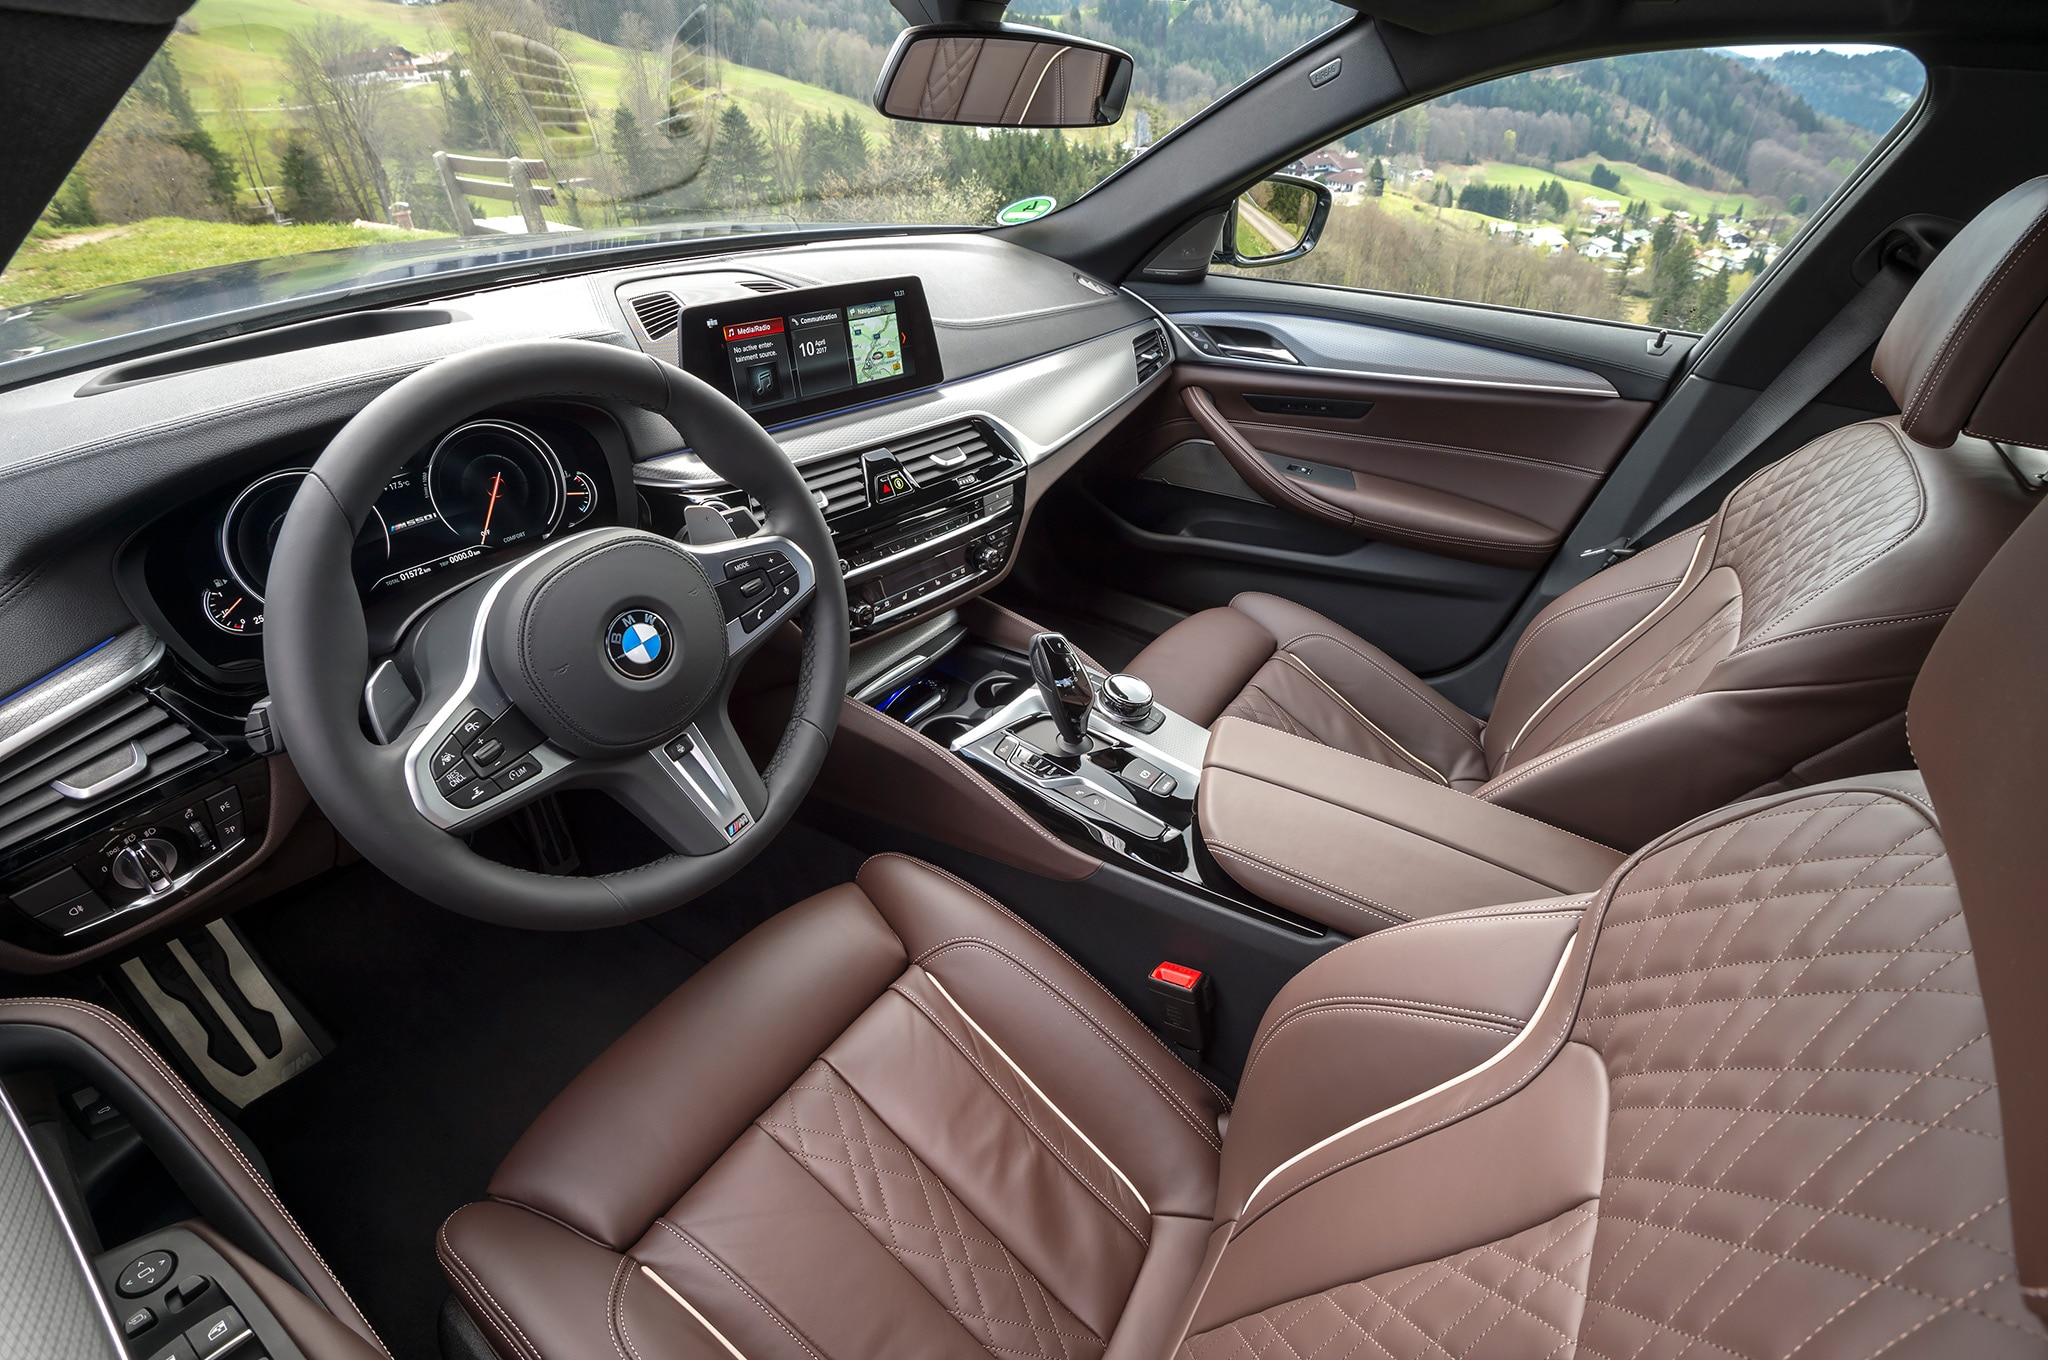 2018 BMW M550i Long-Term Test Update 2: Windscreen Wipeout